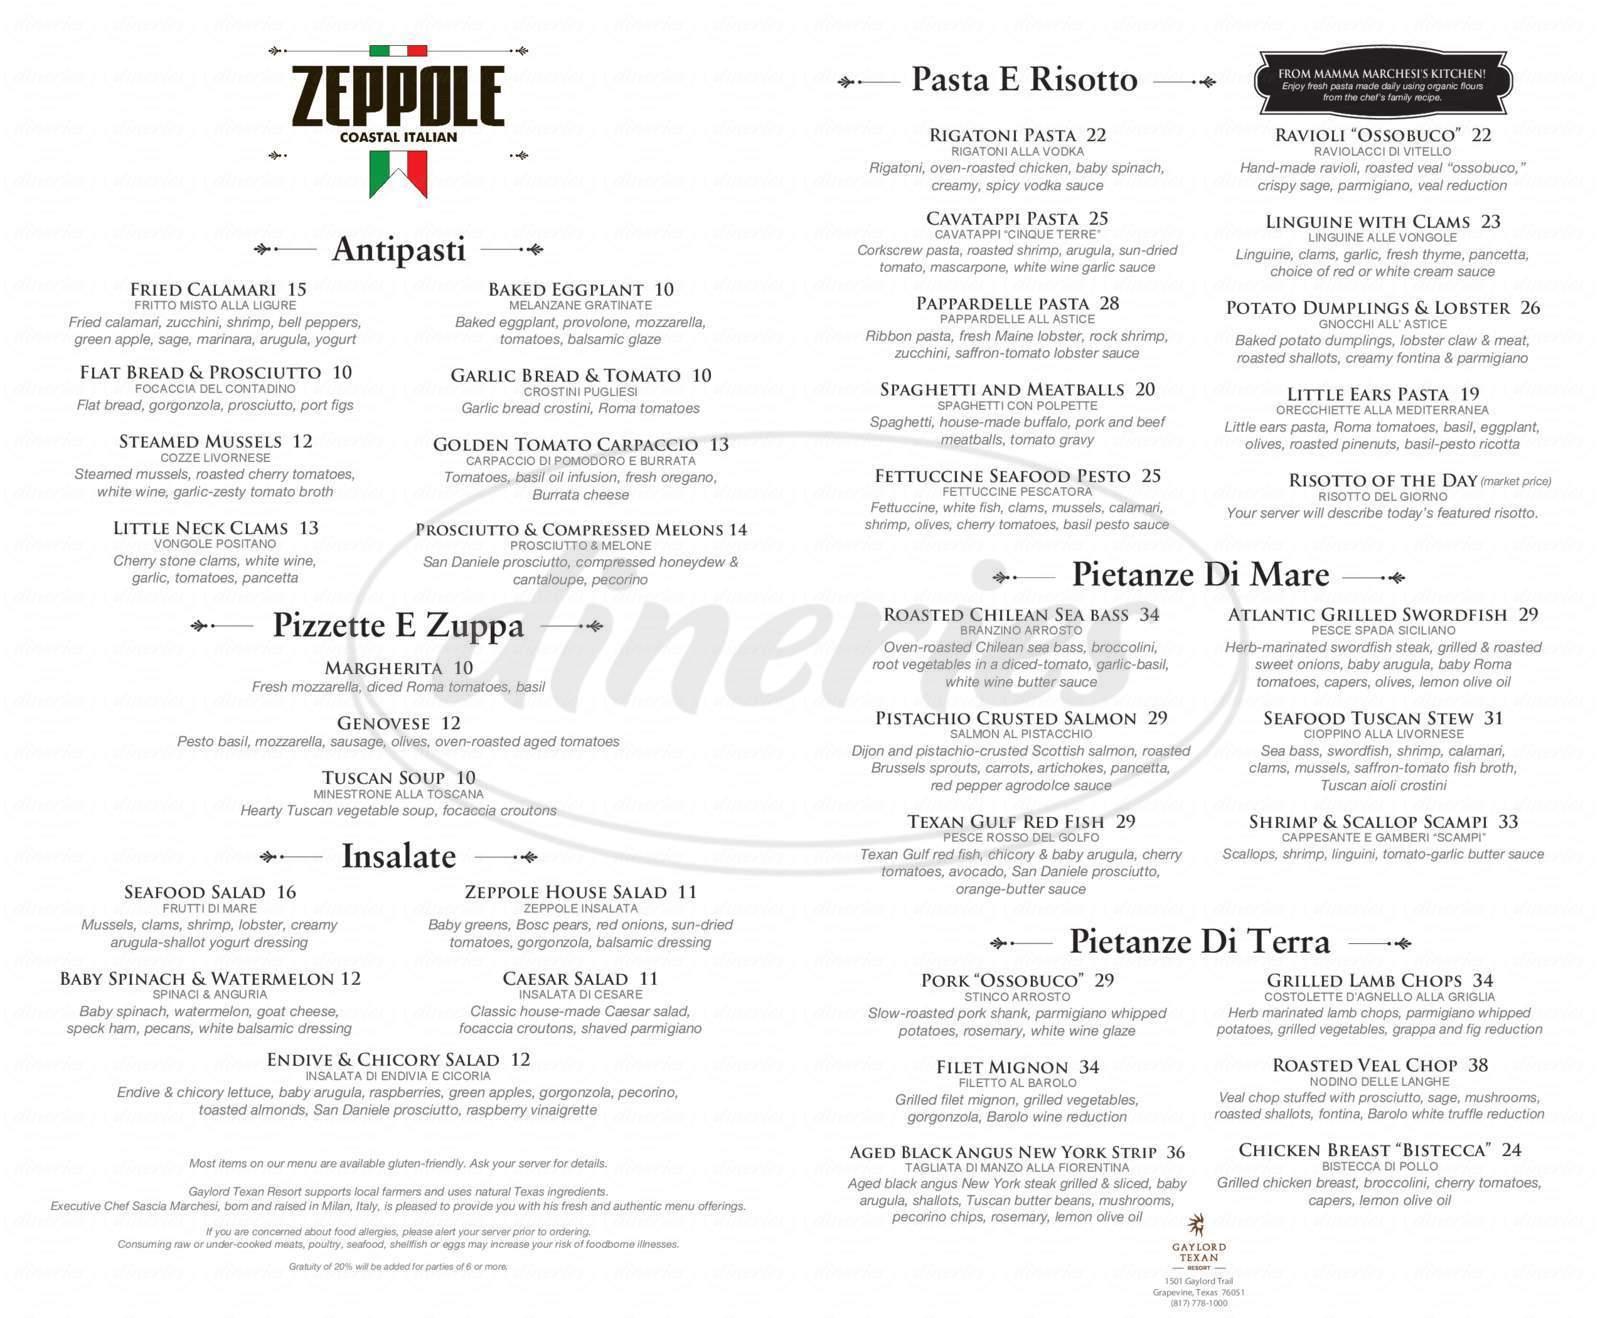 menu for Zeppole